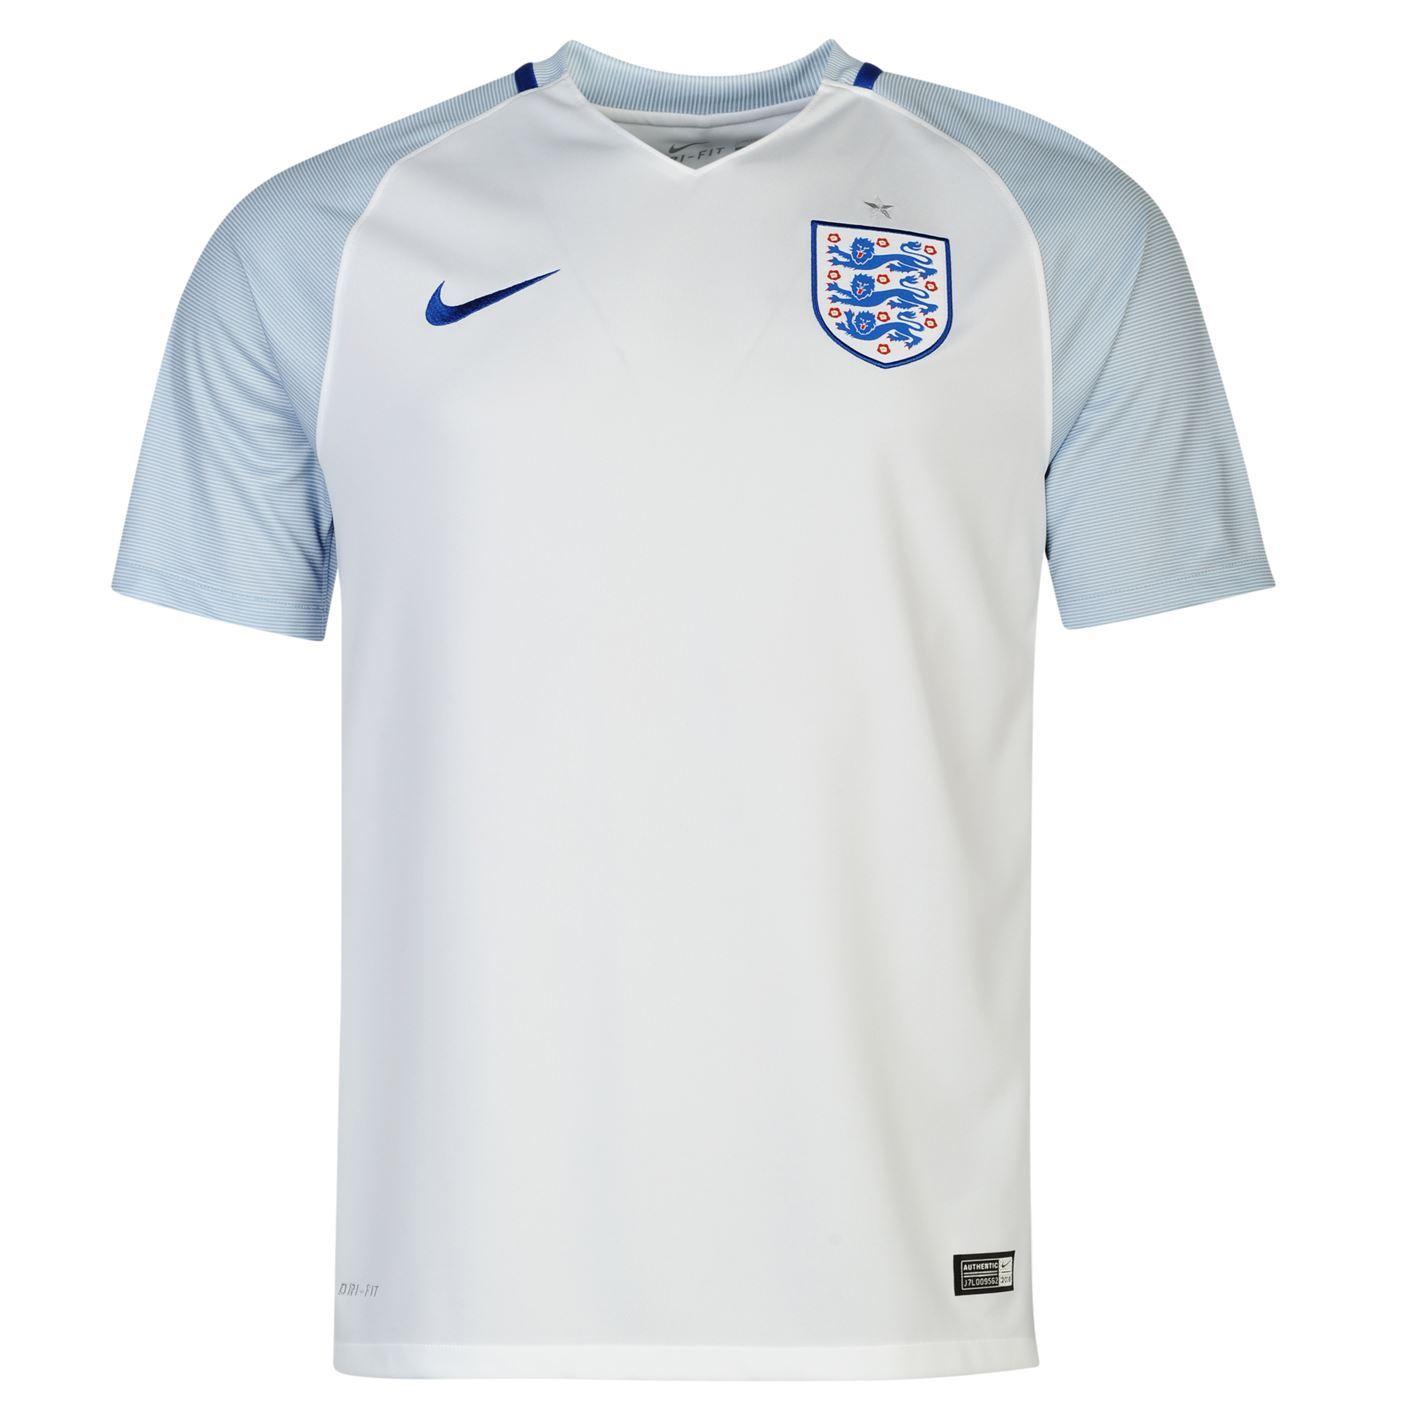 ... Nike England Home Jersey 2016 Mens White Football Soccer Shirt Top ...